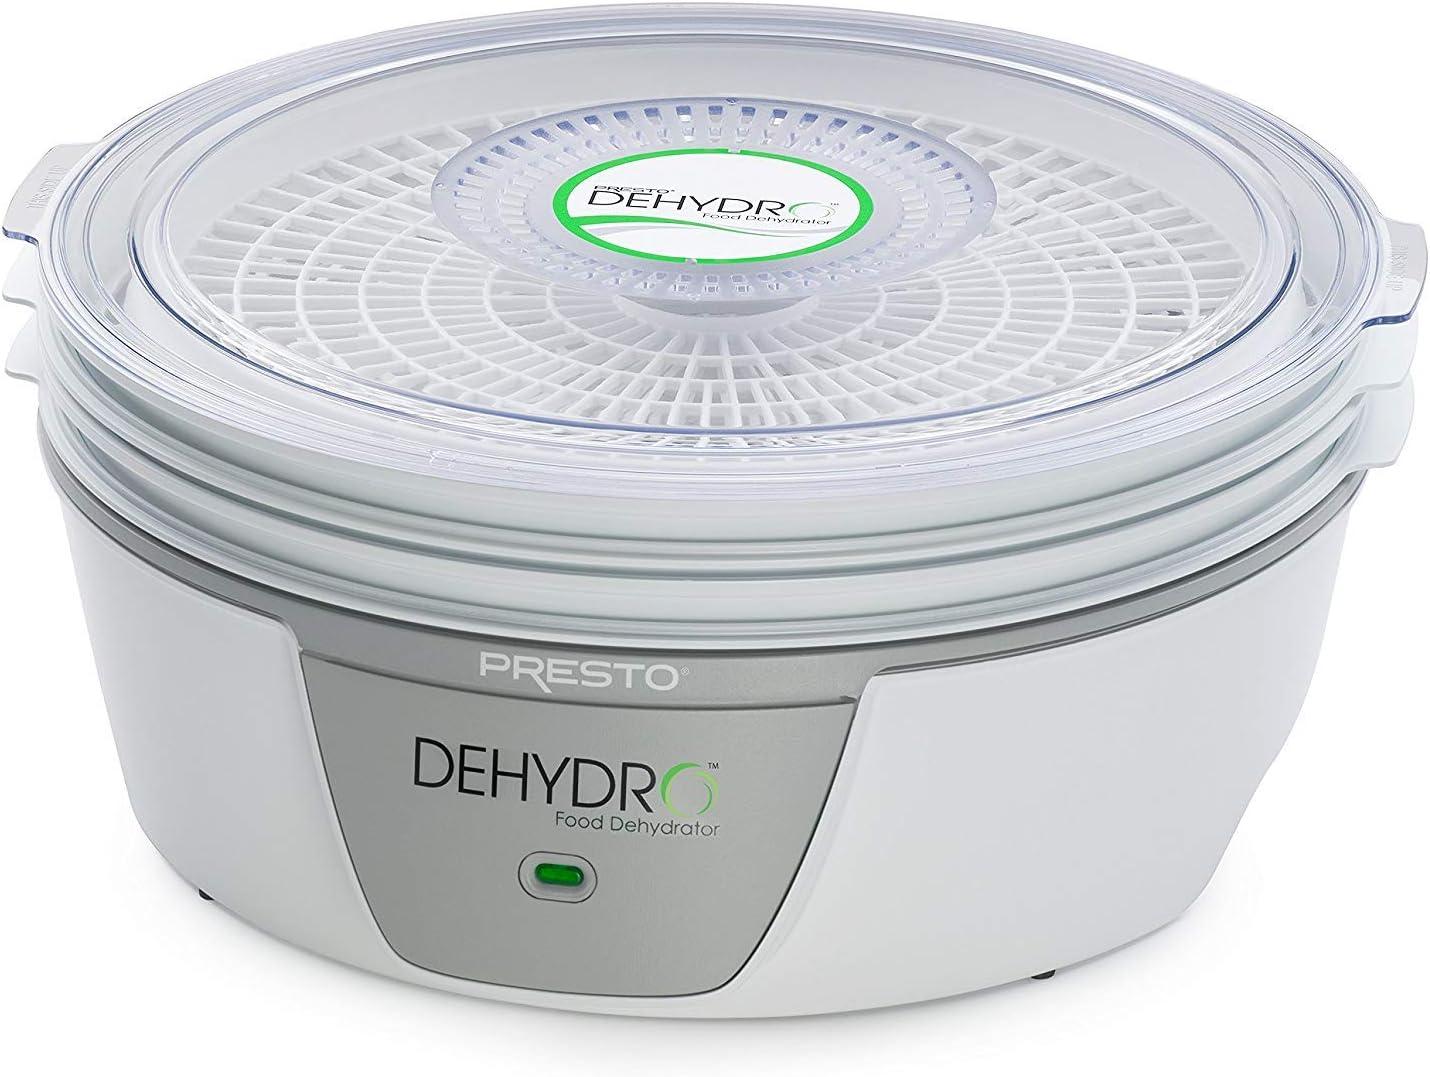 White 120 volts AC 600 watts Presto 06300 Electric Food Dehydrator